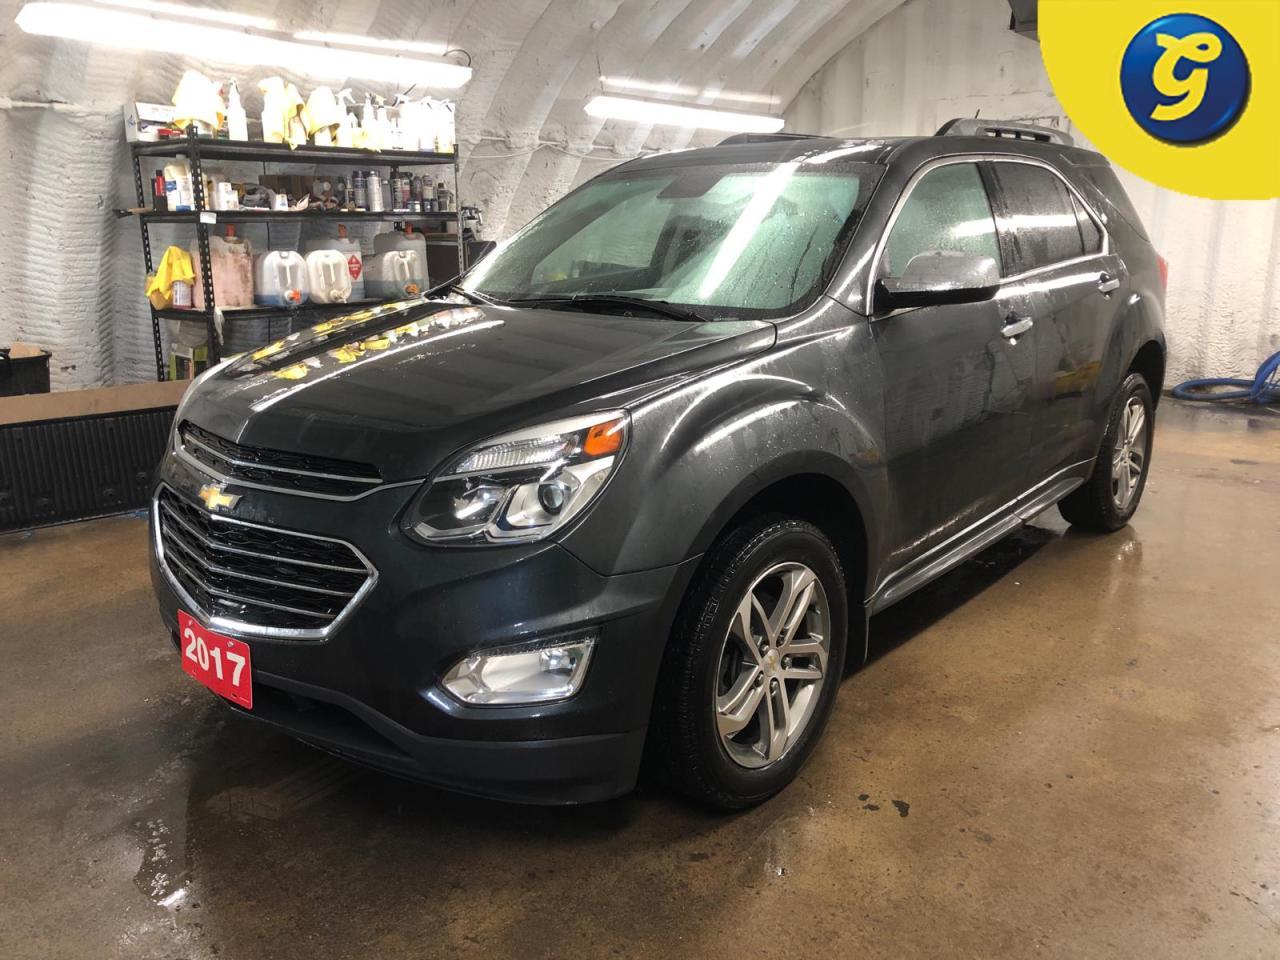 Used 2017 Chevrolet Equinox Premier Awd Navigation